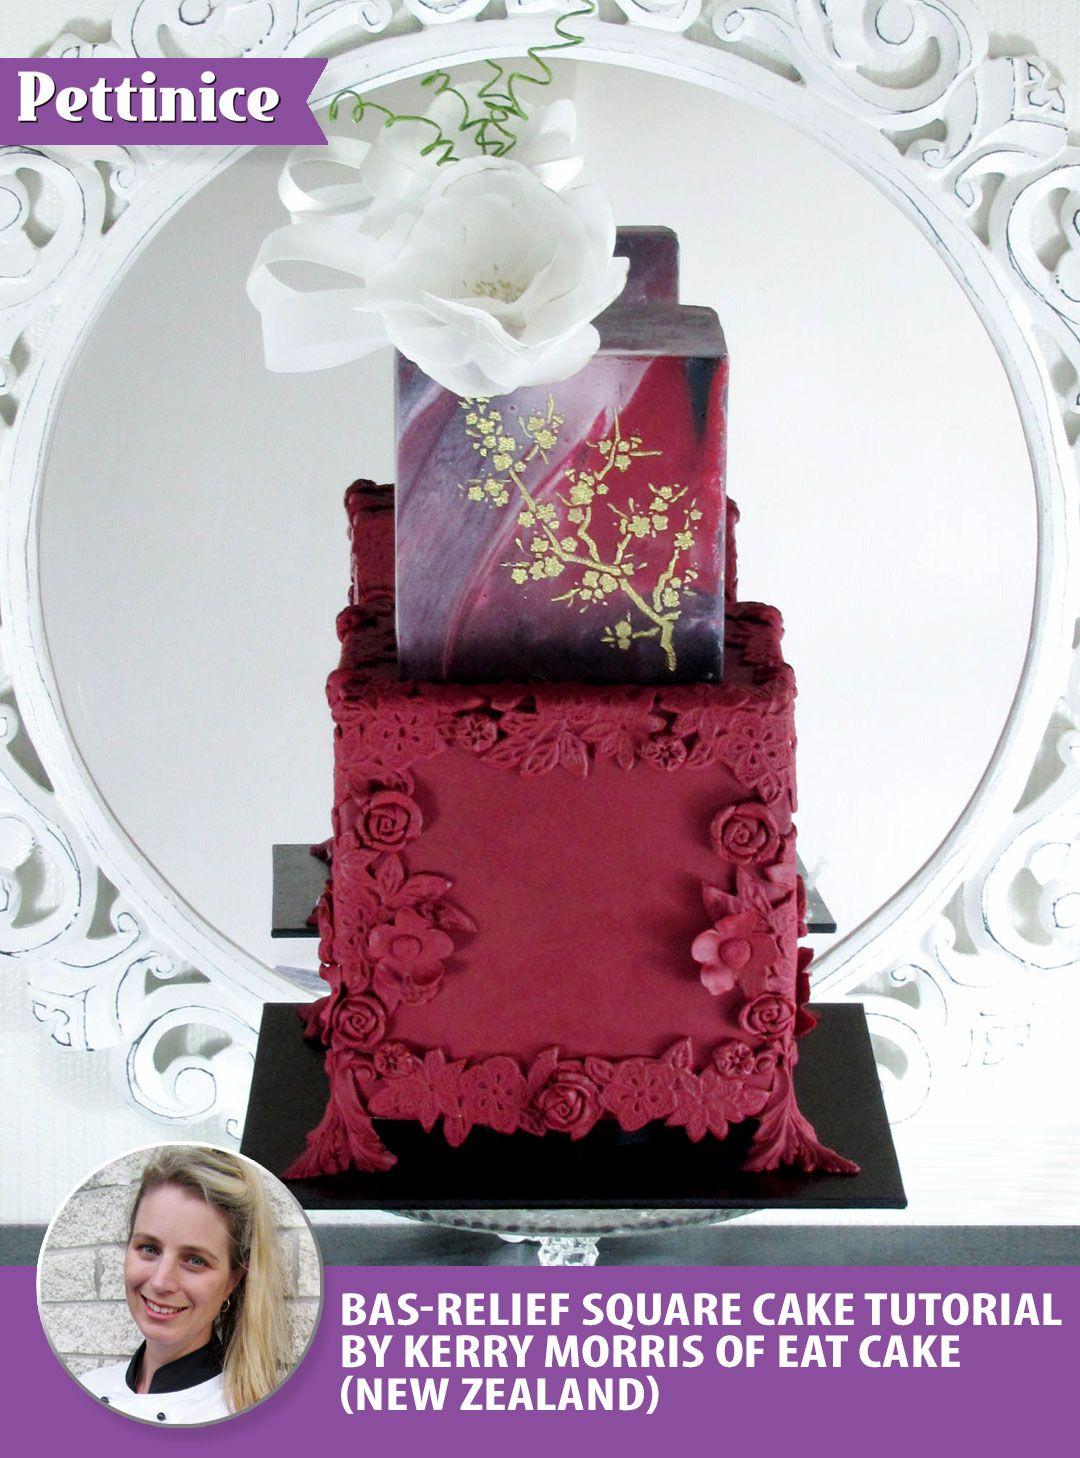 Cake tutorial for simple basrelief design on a burgundy